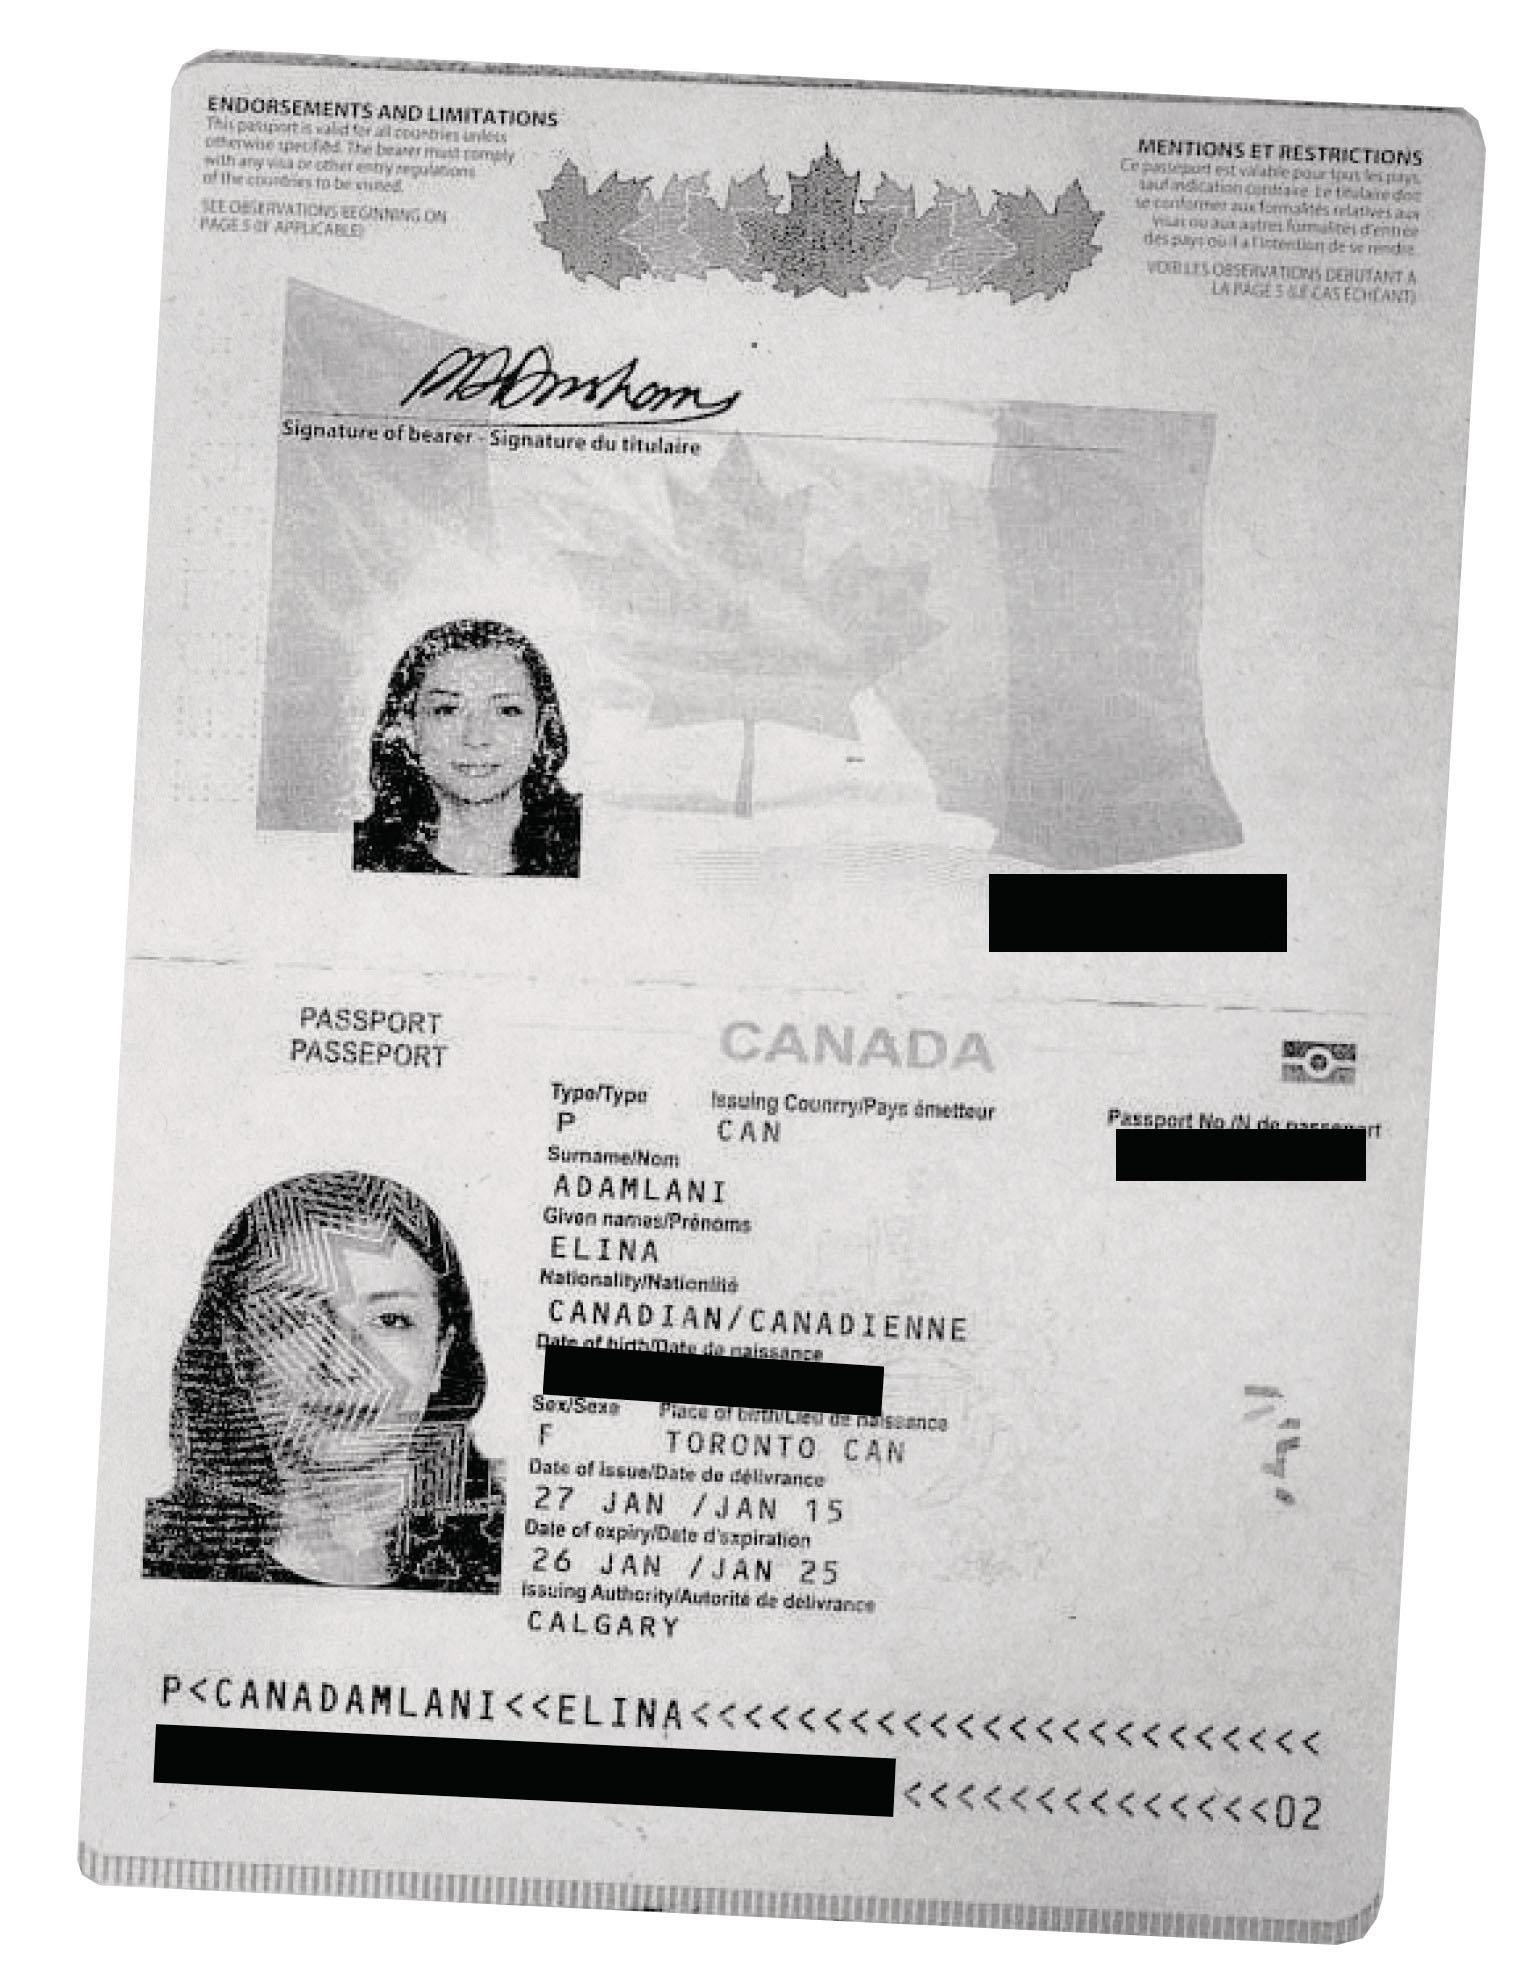 The falsified passport bearing Alizadeh's face and the name Elina Adamlani.